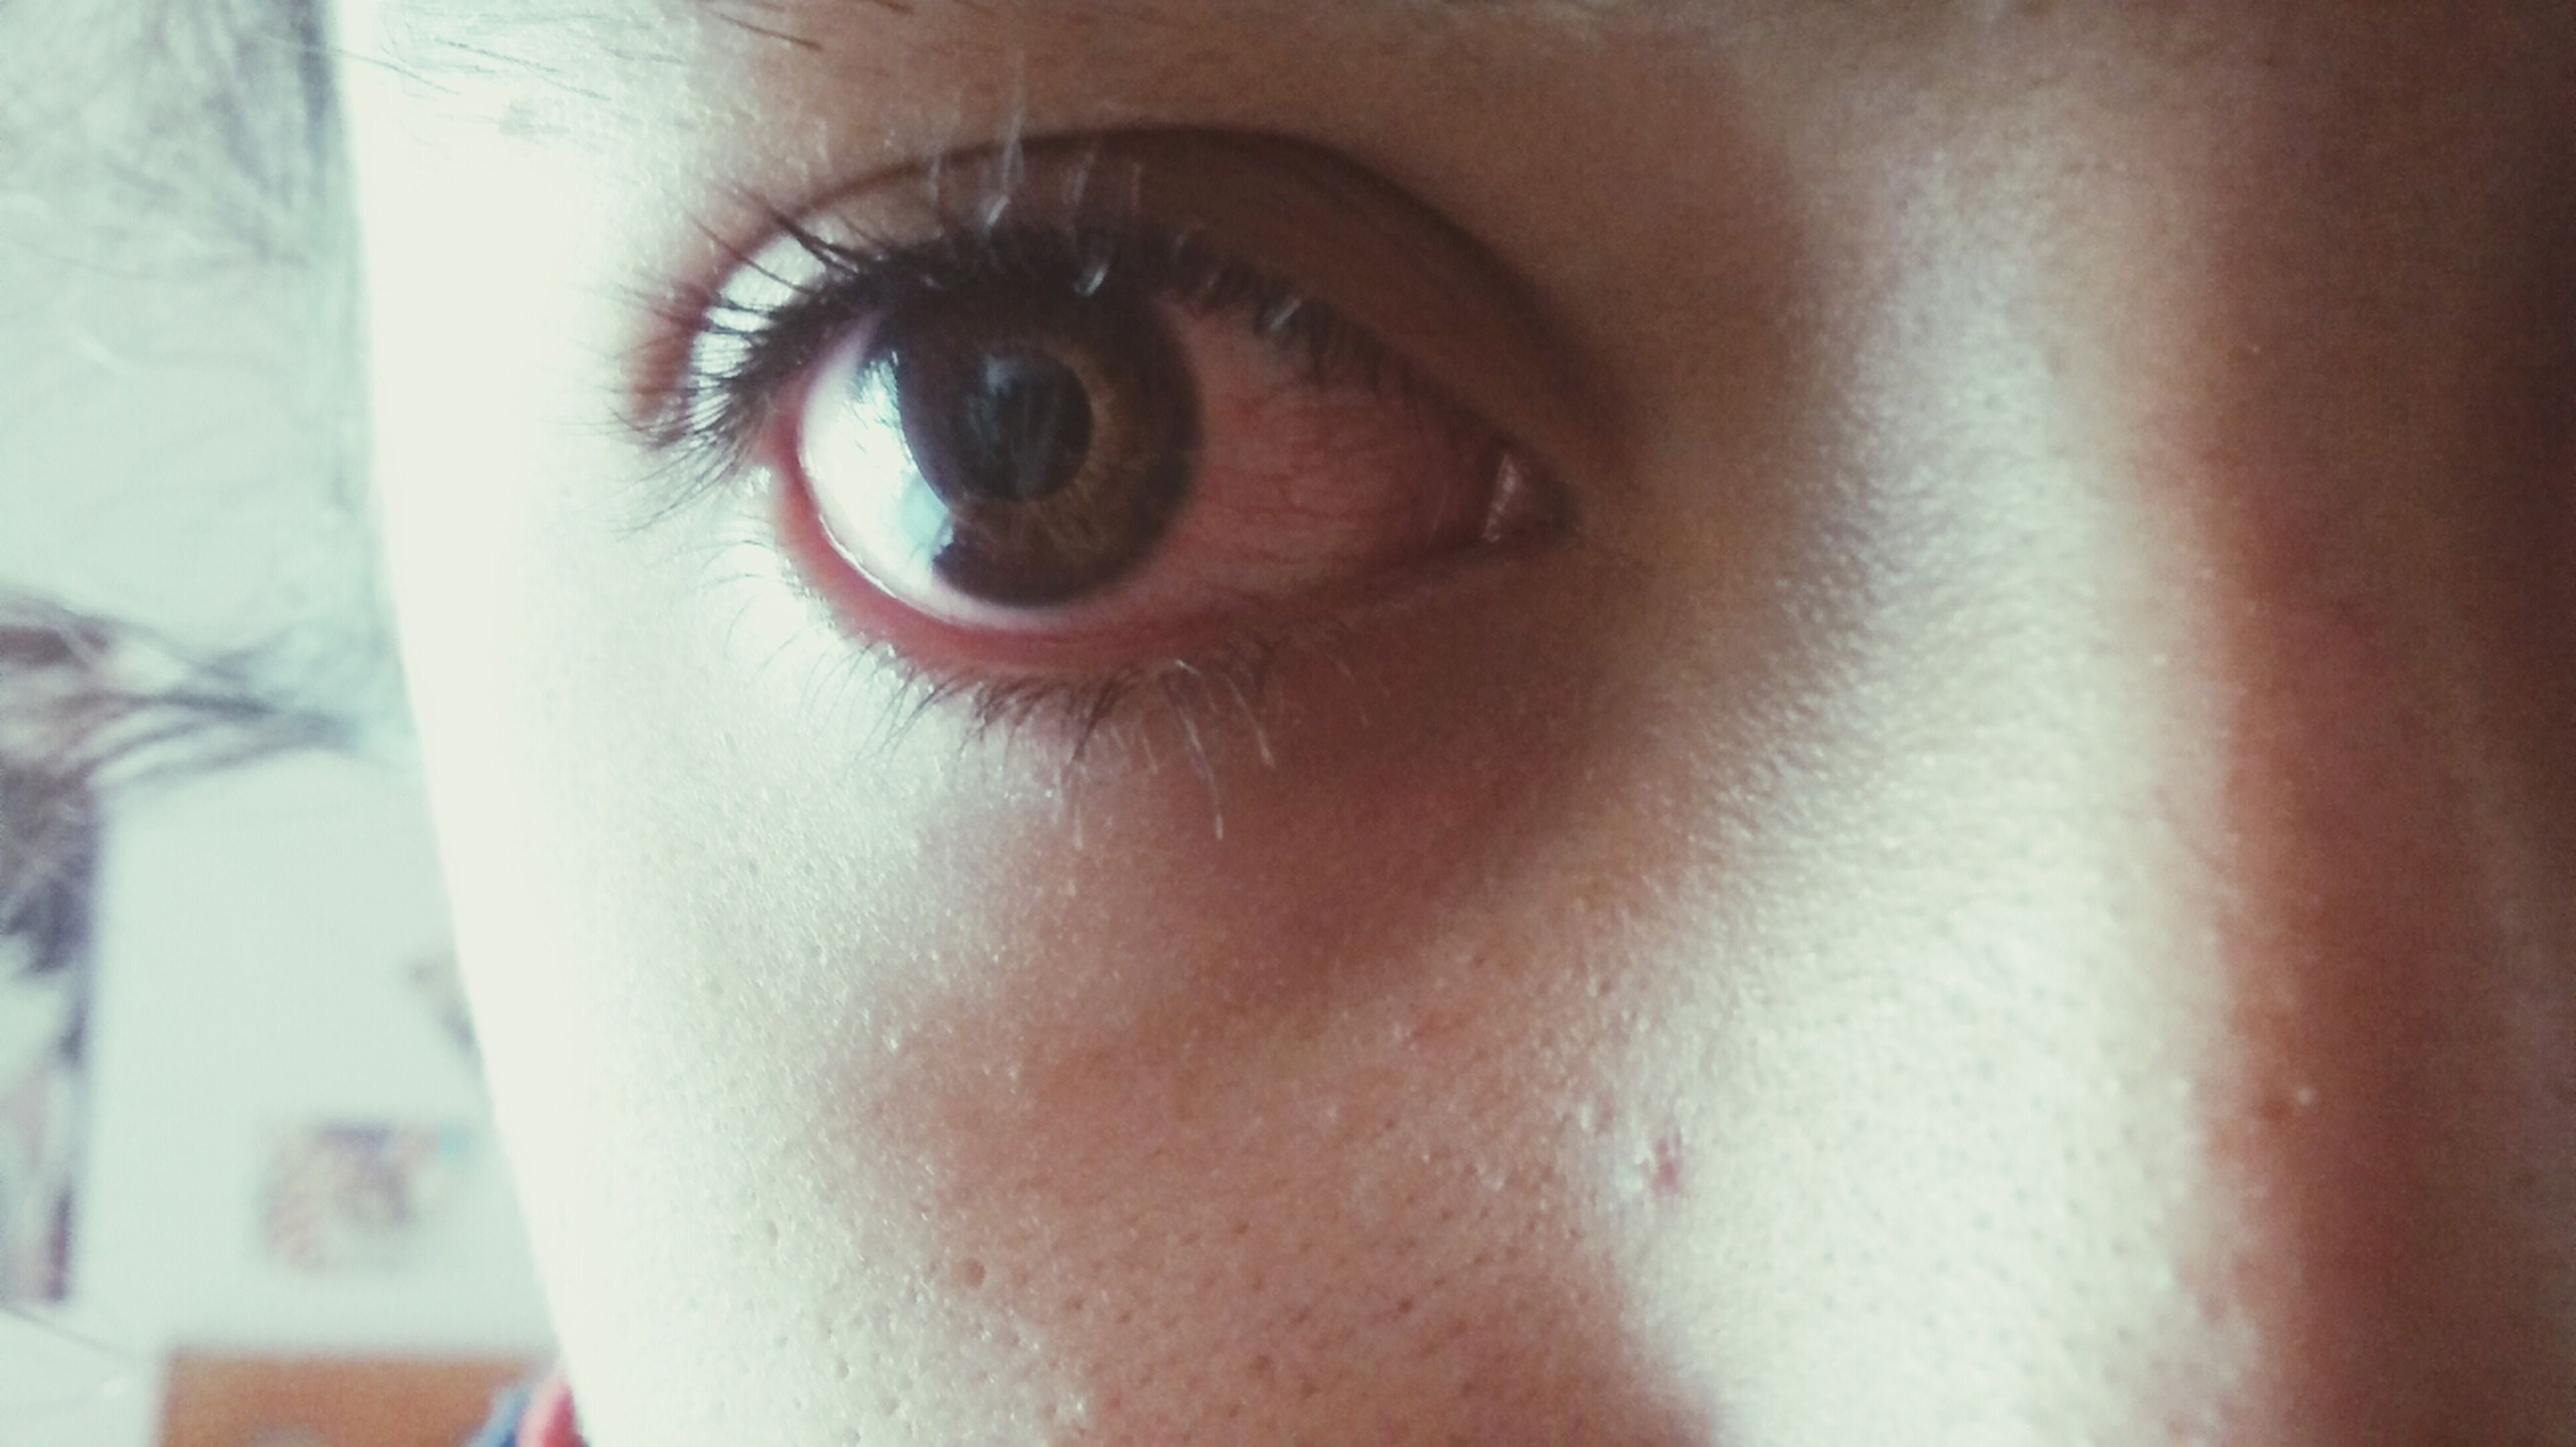 human eye, indoors, close-up, part of, eyelash, human skin, eyesight, portrait, looking at camera, extreme close-up, sensory perception, human face, lifestyles, unrecognizable person, person, iris - eye, cropped